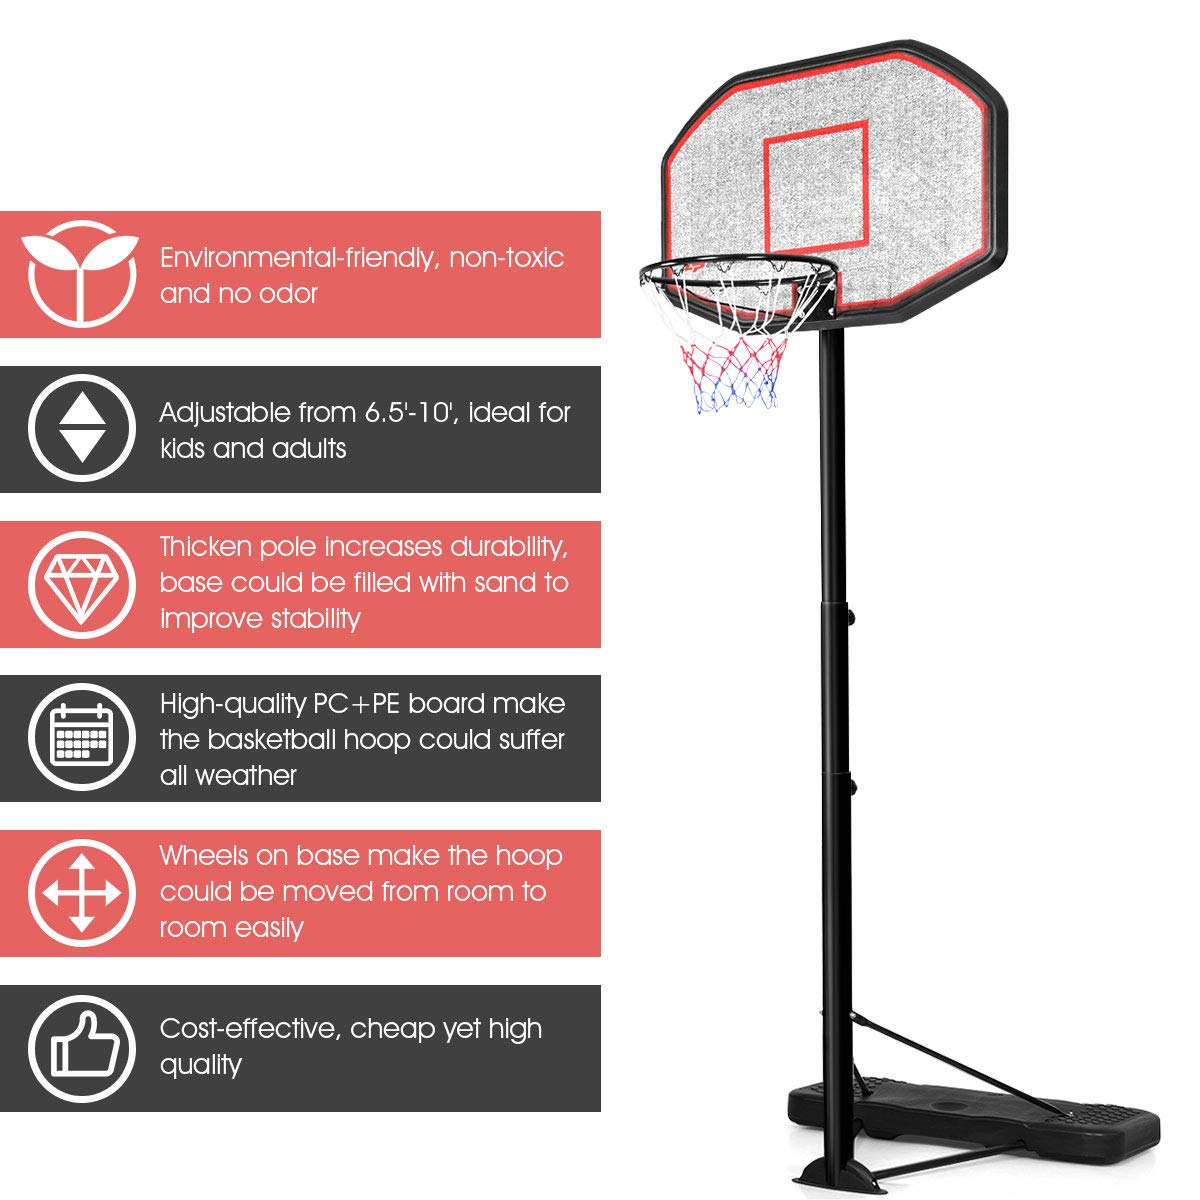 Giantex Portable Basketball Hoop 10 Ft Indoor Outdoor Adjustable Height 6.5-10 Basketball Hoop for Kids Adults 43 Inch Backboard